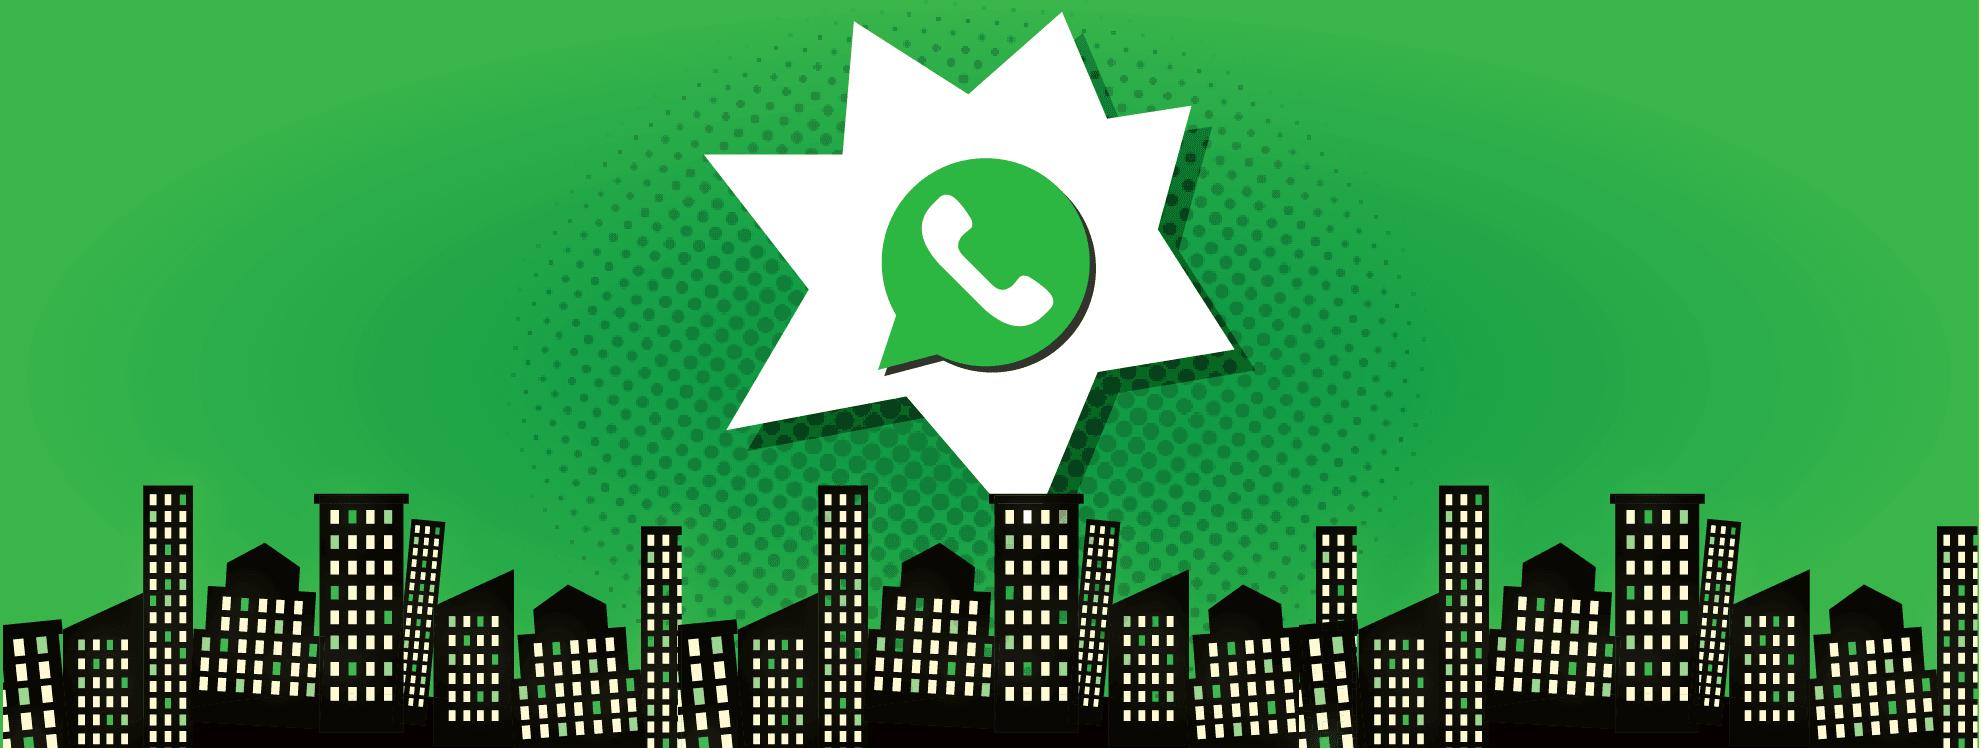 WhatsApp en la empresa: ventajas e inconvenientes